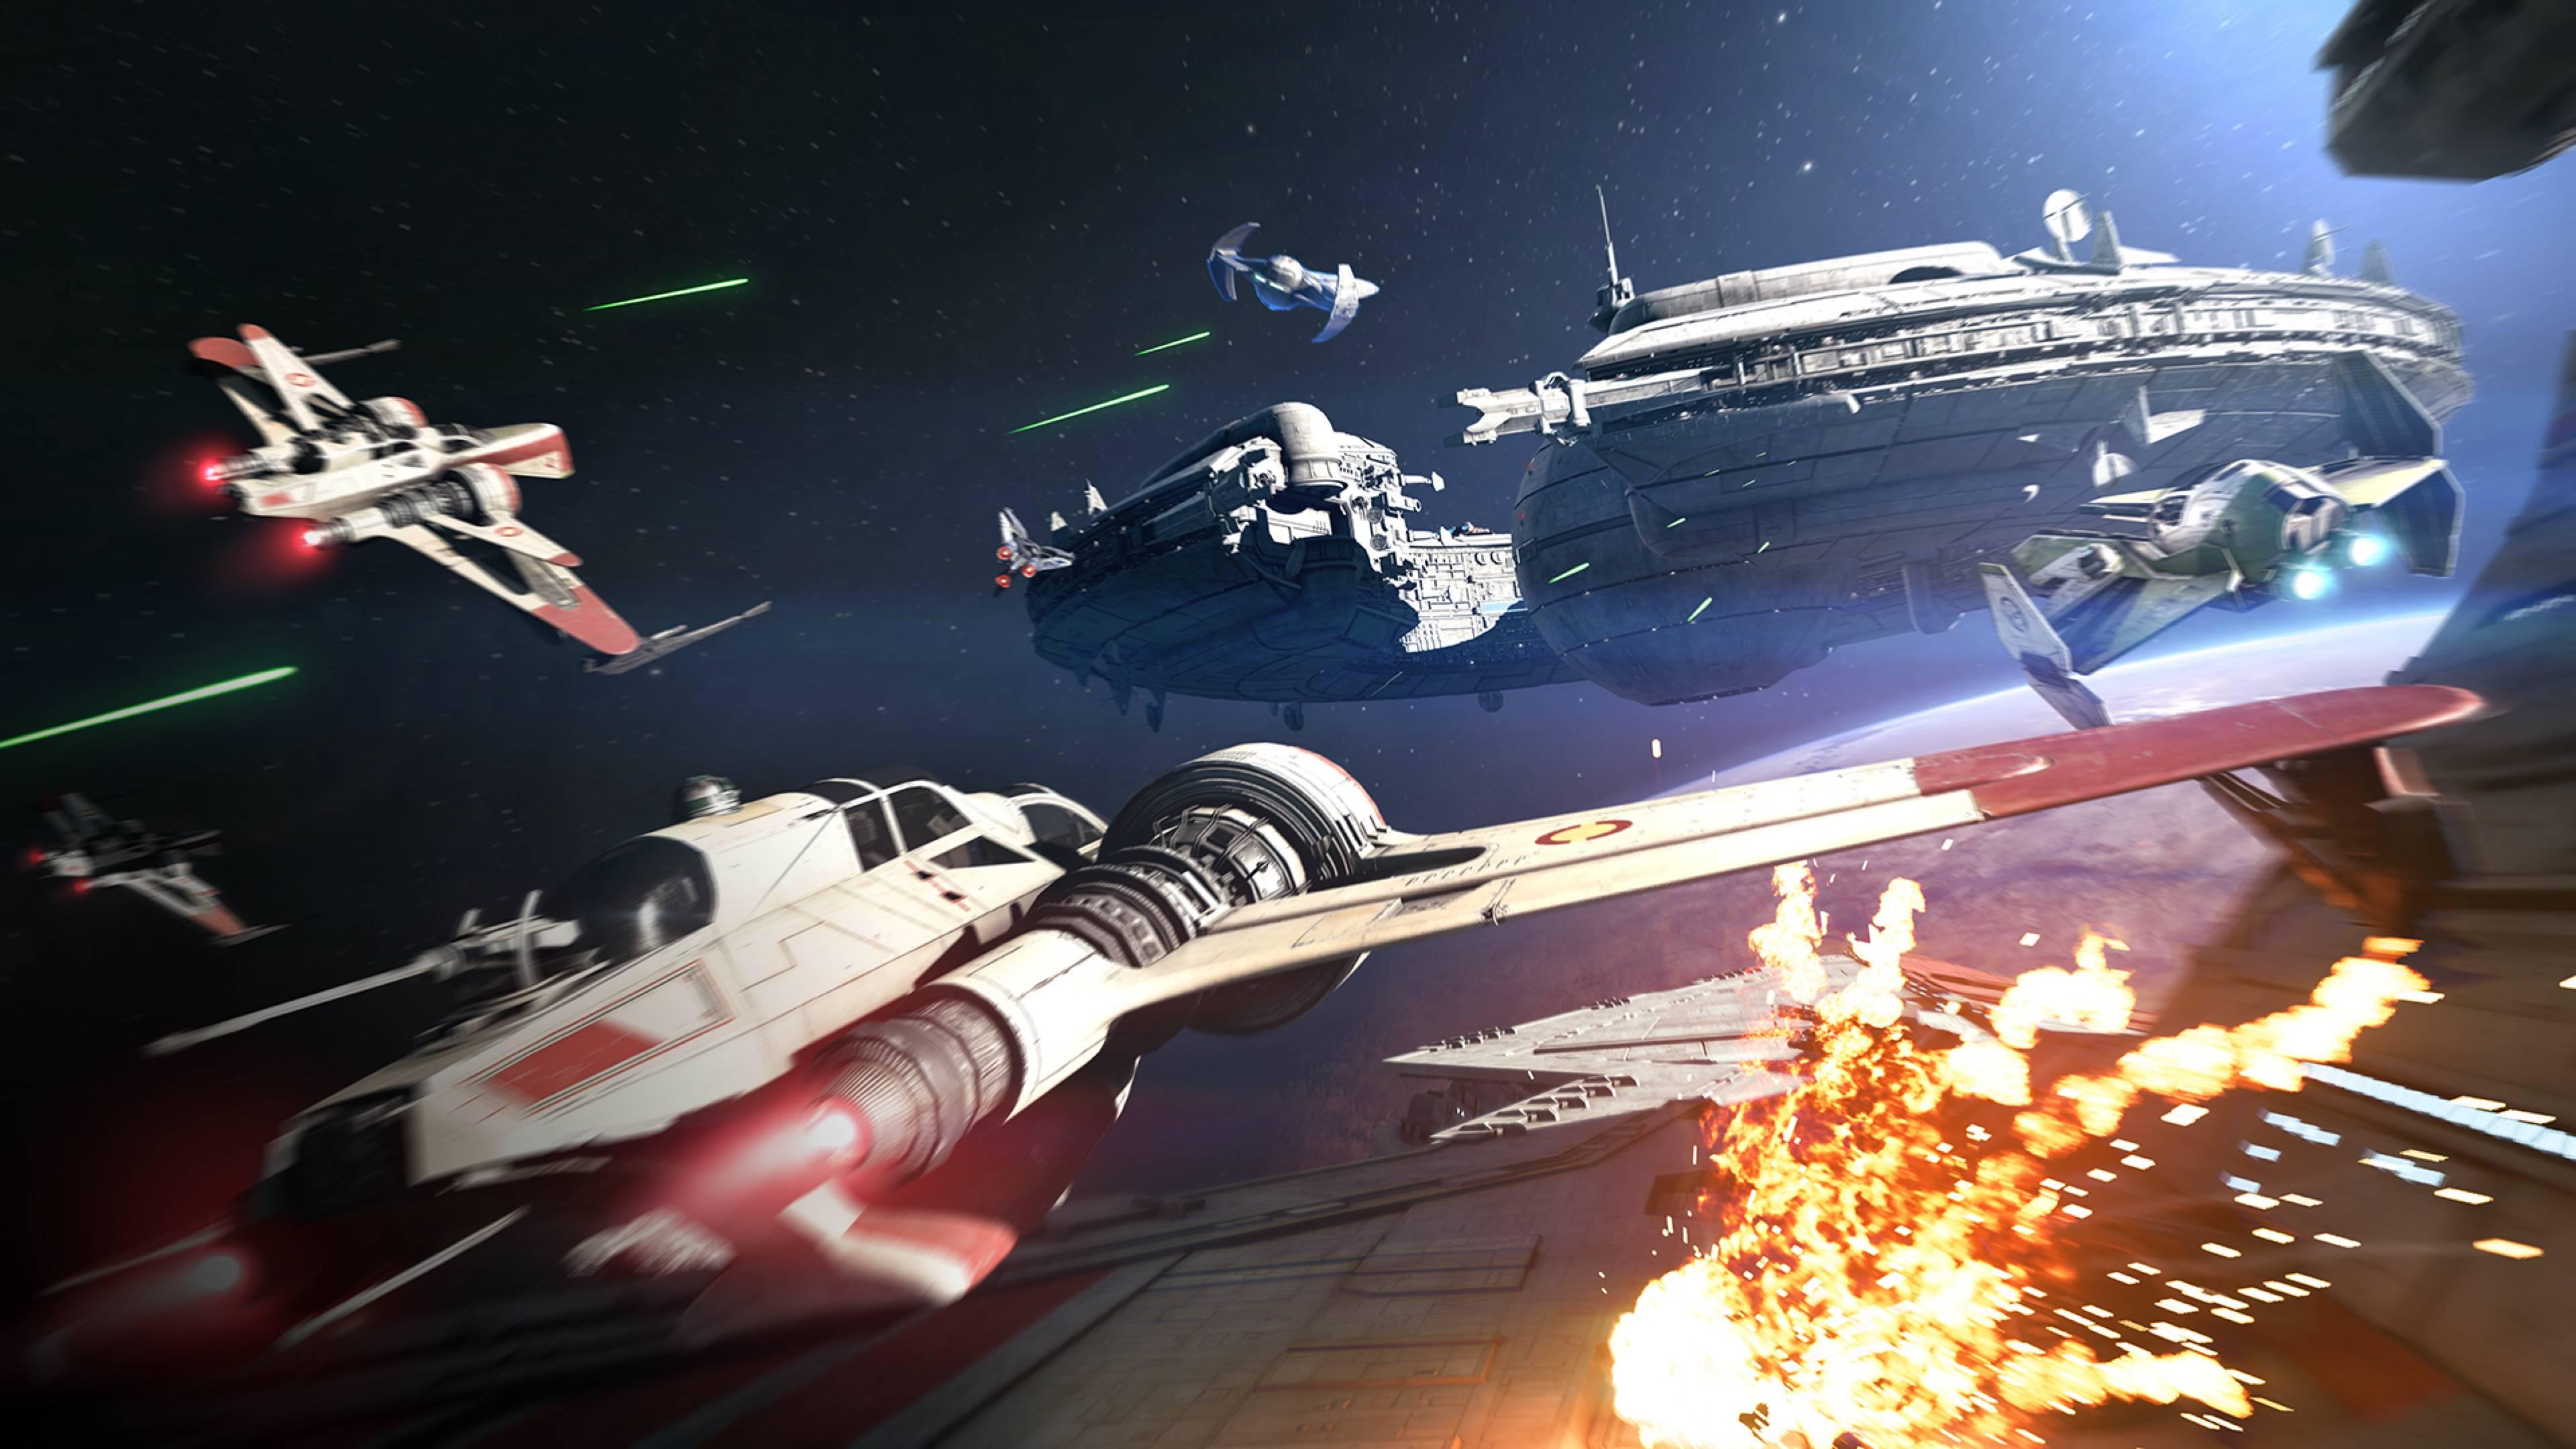 Ryloth Lucrehulk Battleship Star Wars Battlefront Wiki Fandom 3840x2160